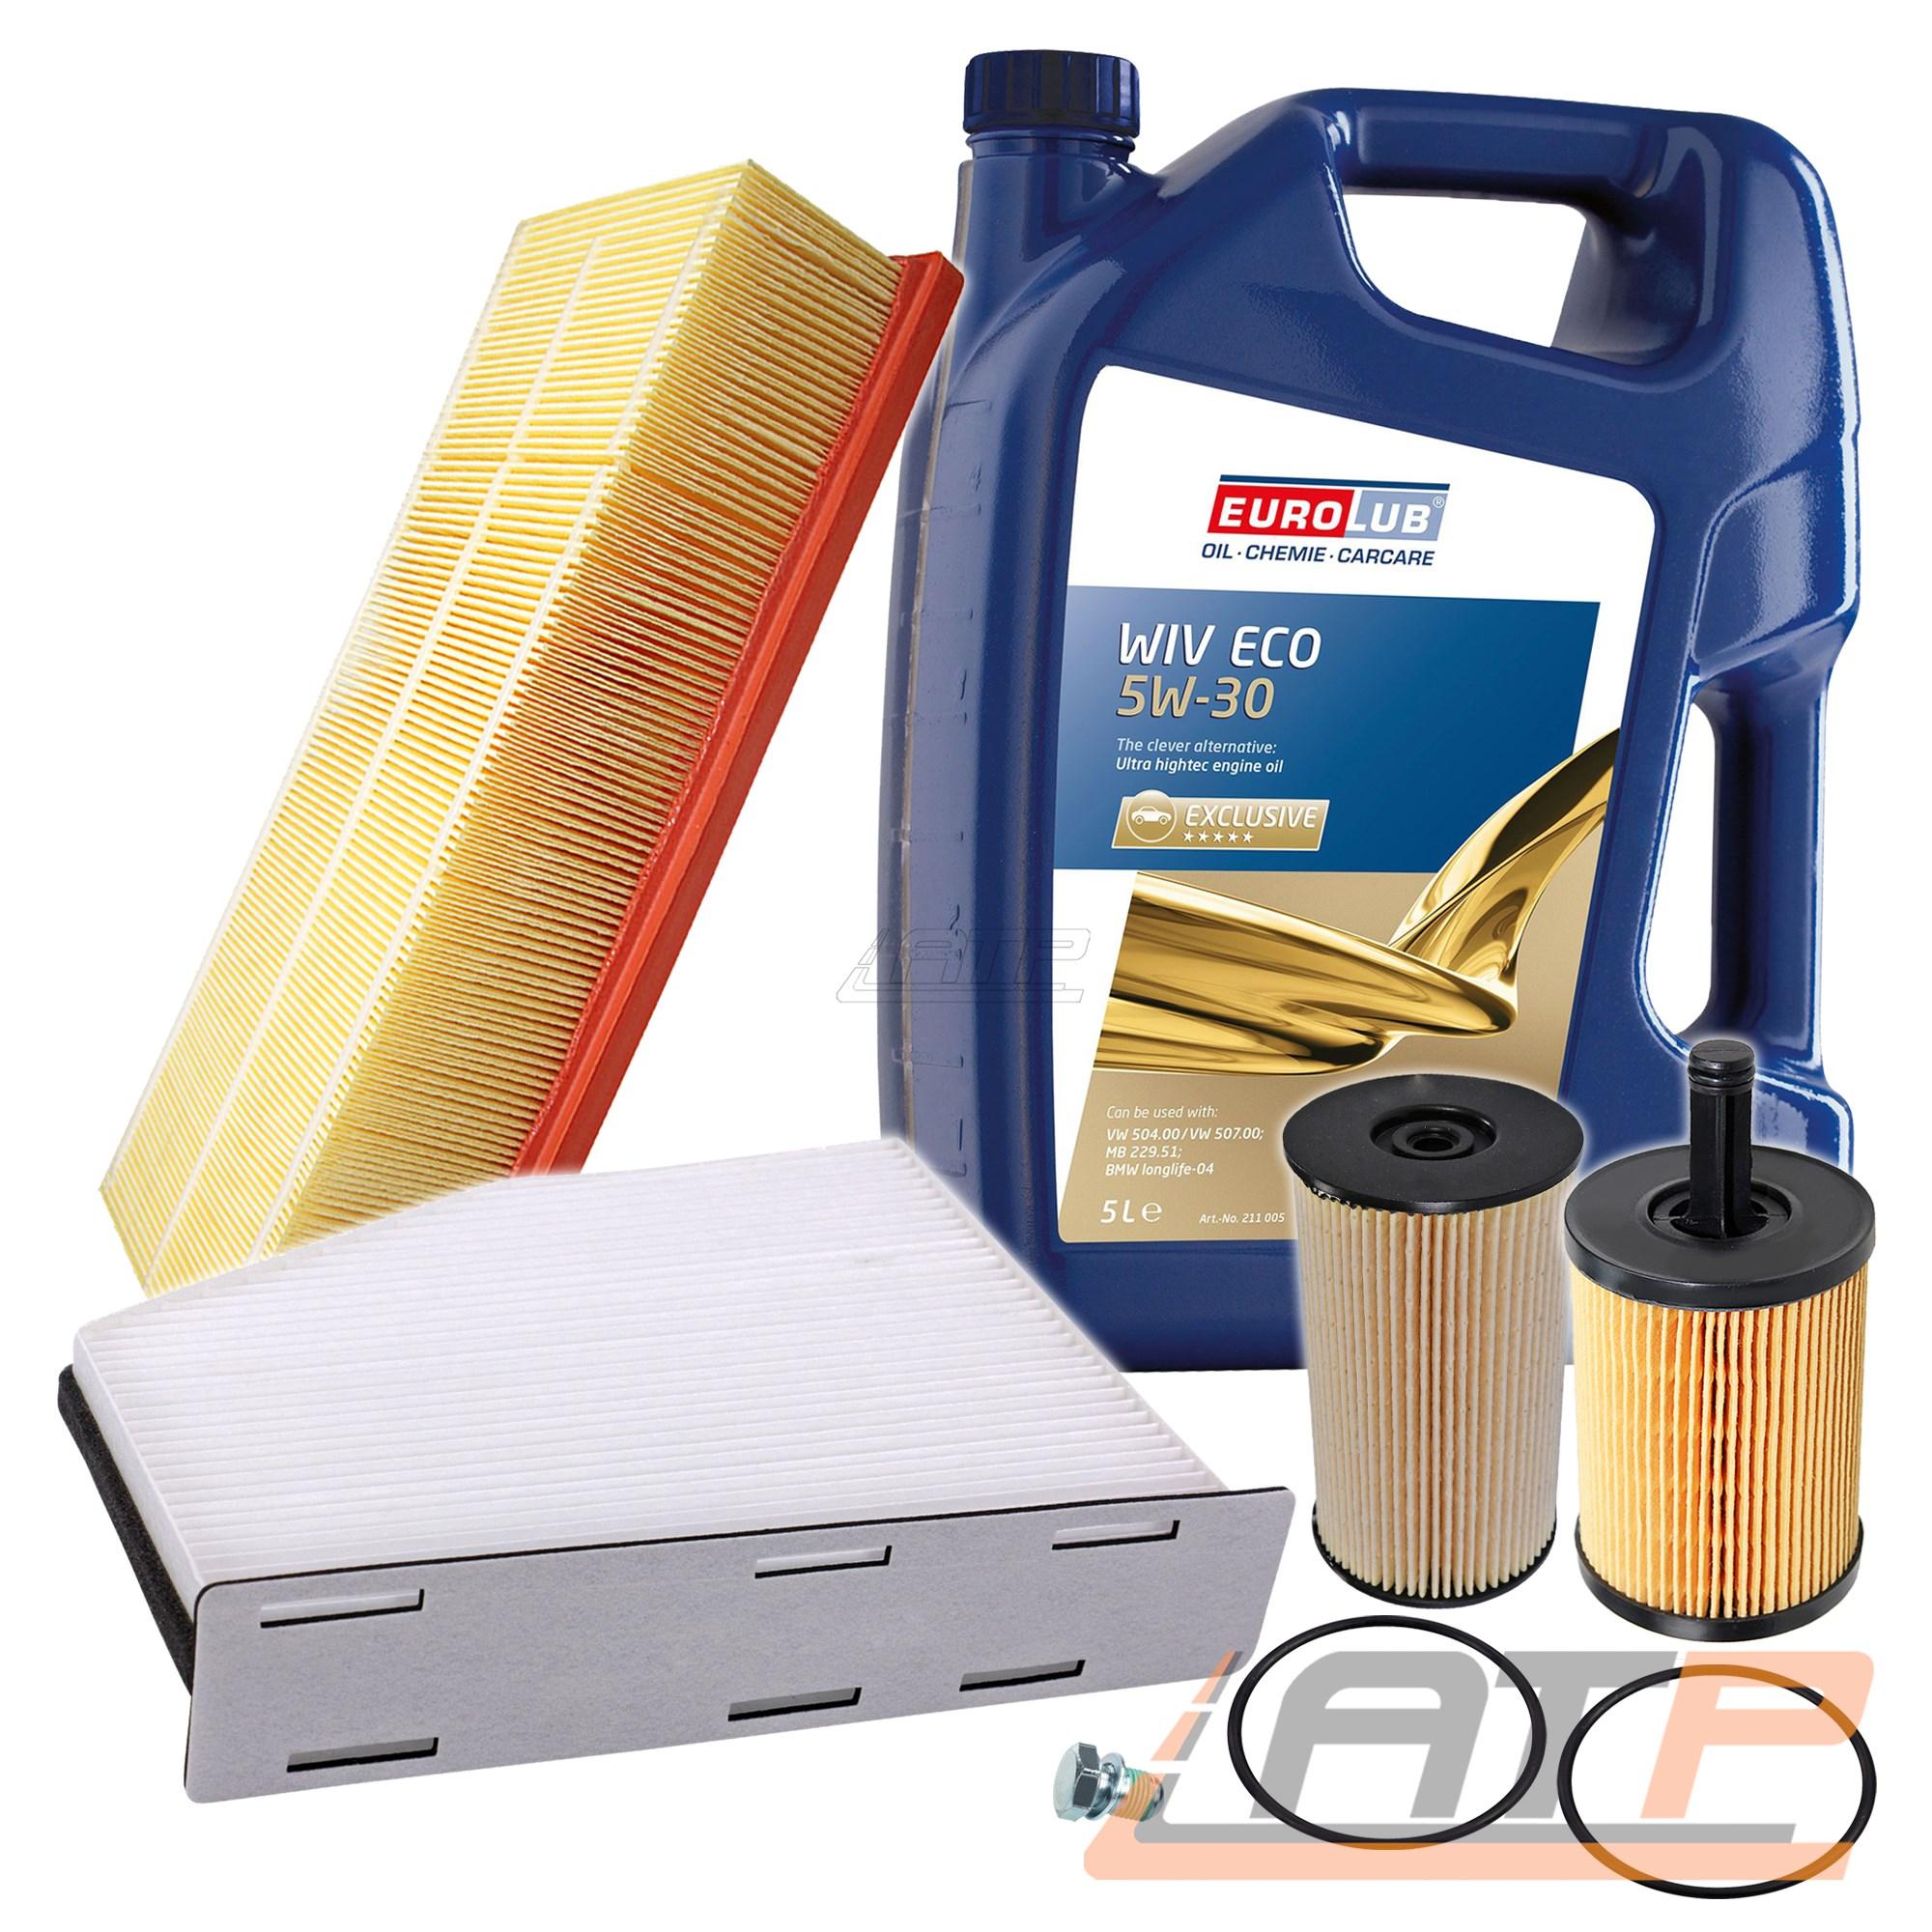 inspektions kit inspektionspaket filtersatz b vw golf 6. Black Bedroom Furniture Sets. Home Design Ideas